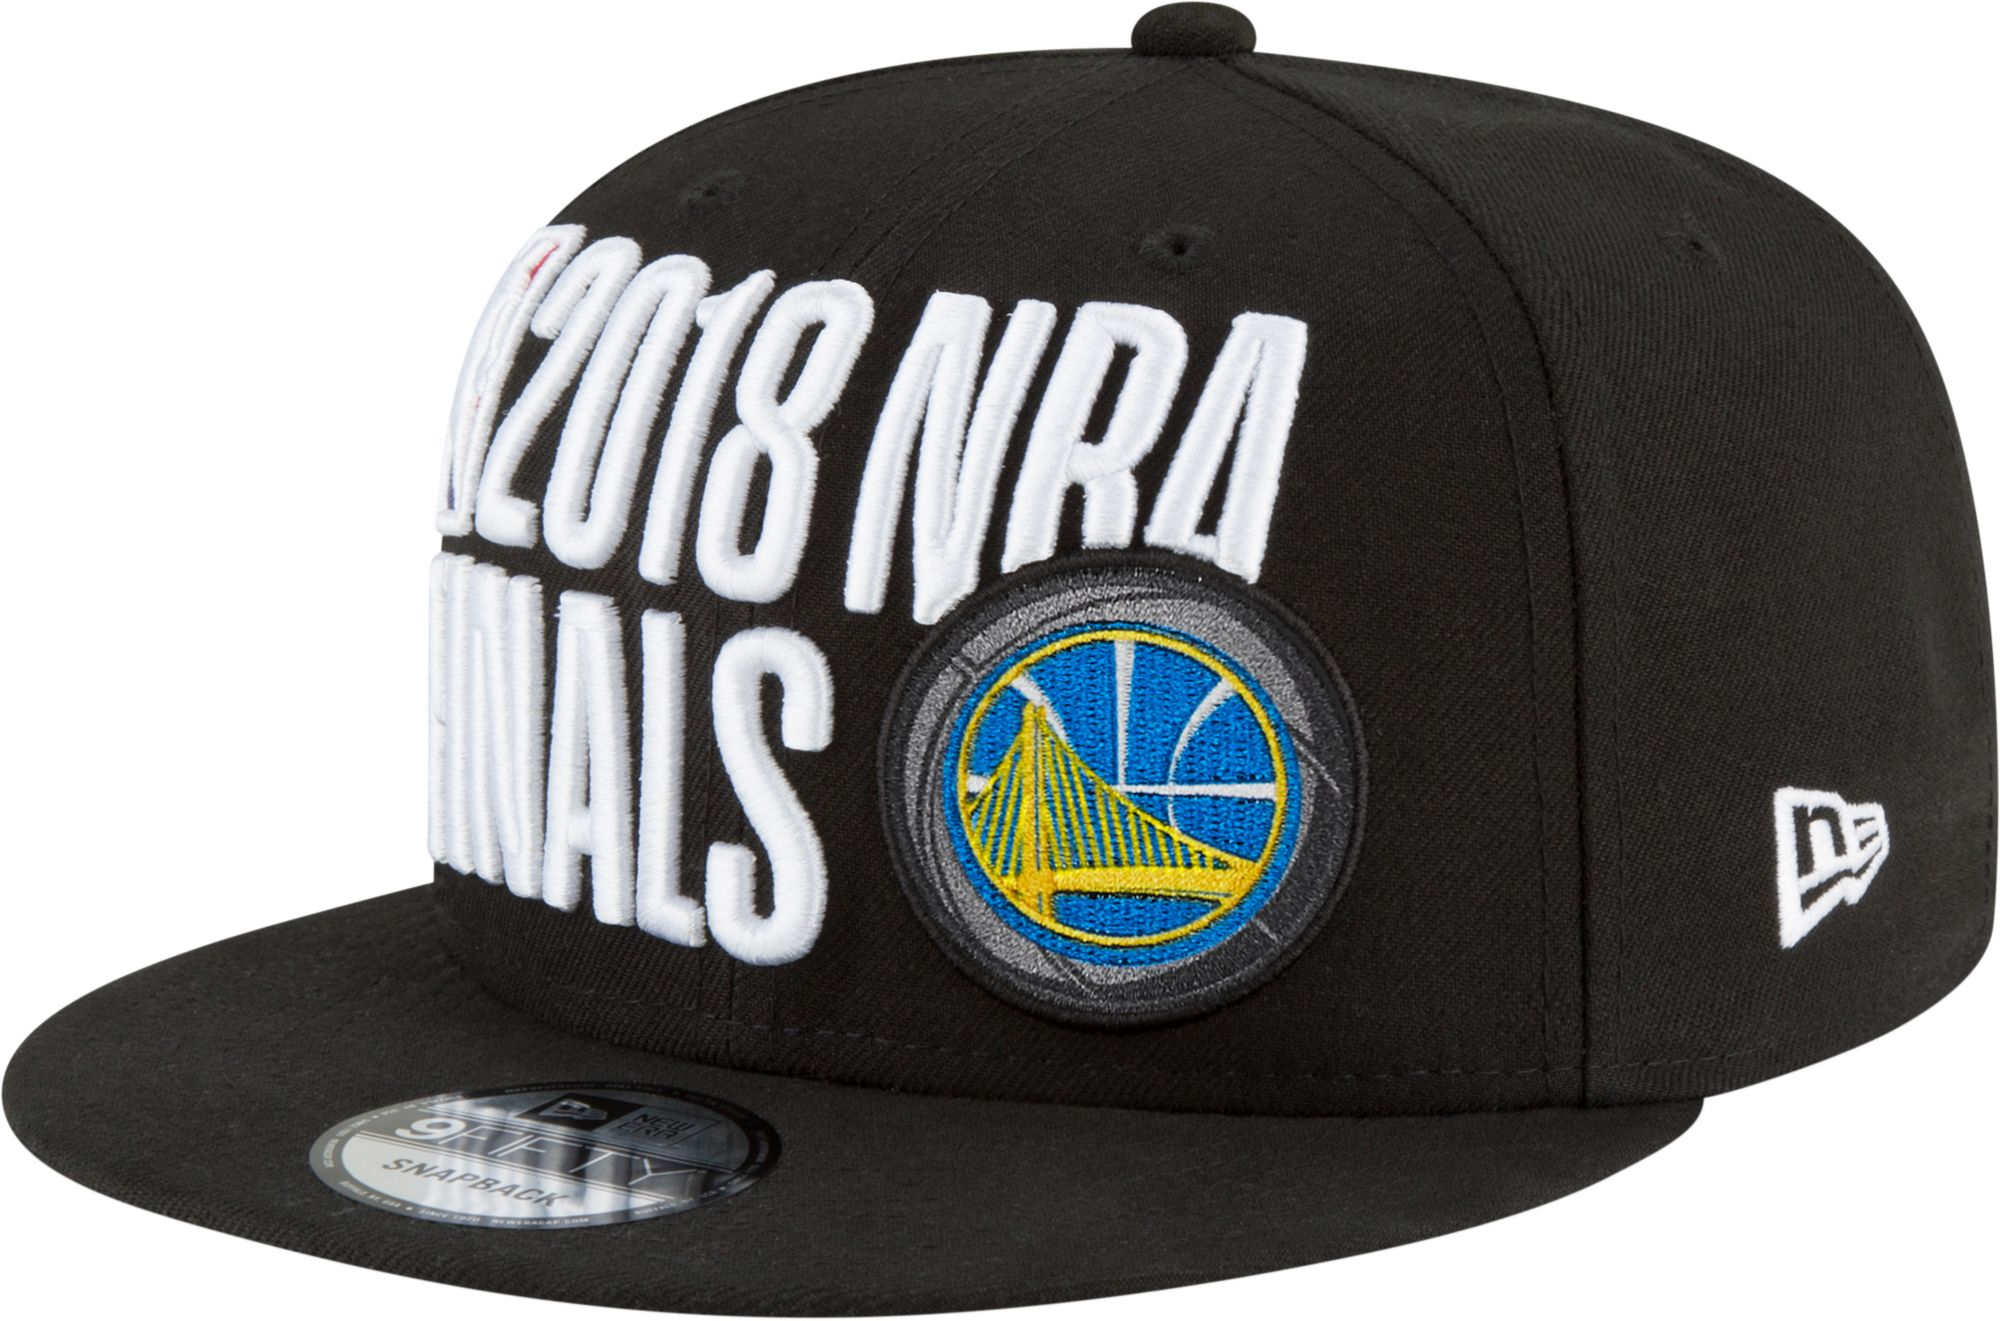 big sale b9b84 0d4dc New Era Men s 2018 NBA Finals Golden State Warriors 9Fifty Locker Room  Adjustable Snapback Hat, Black